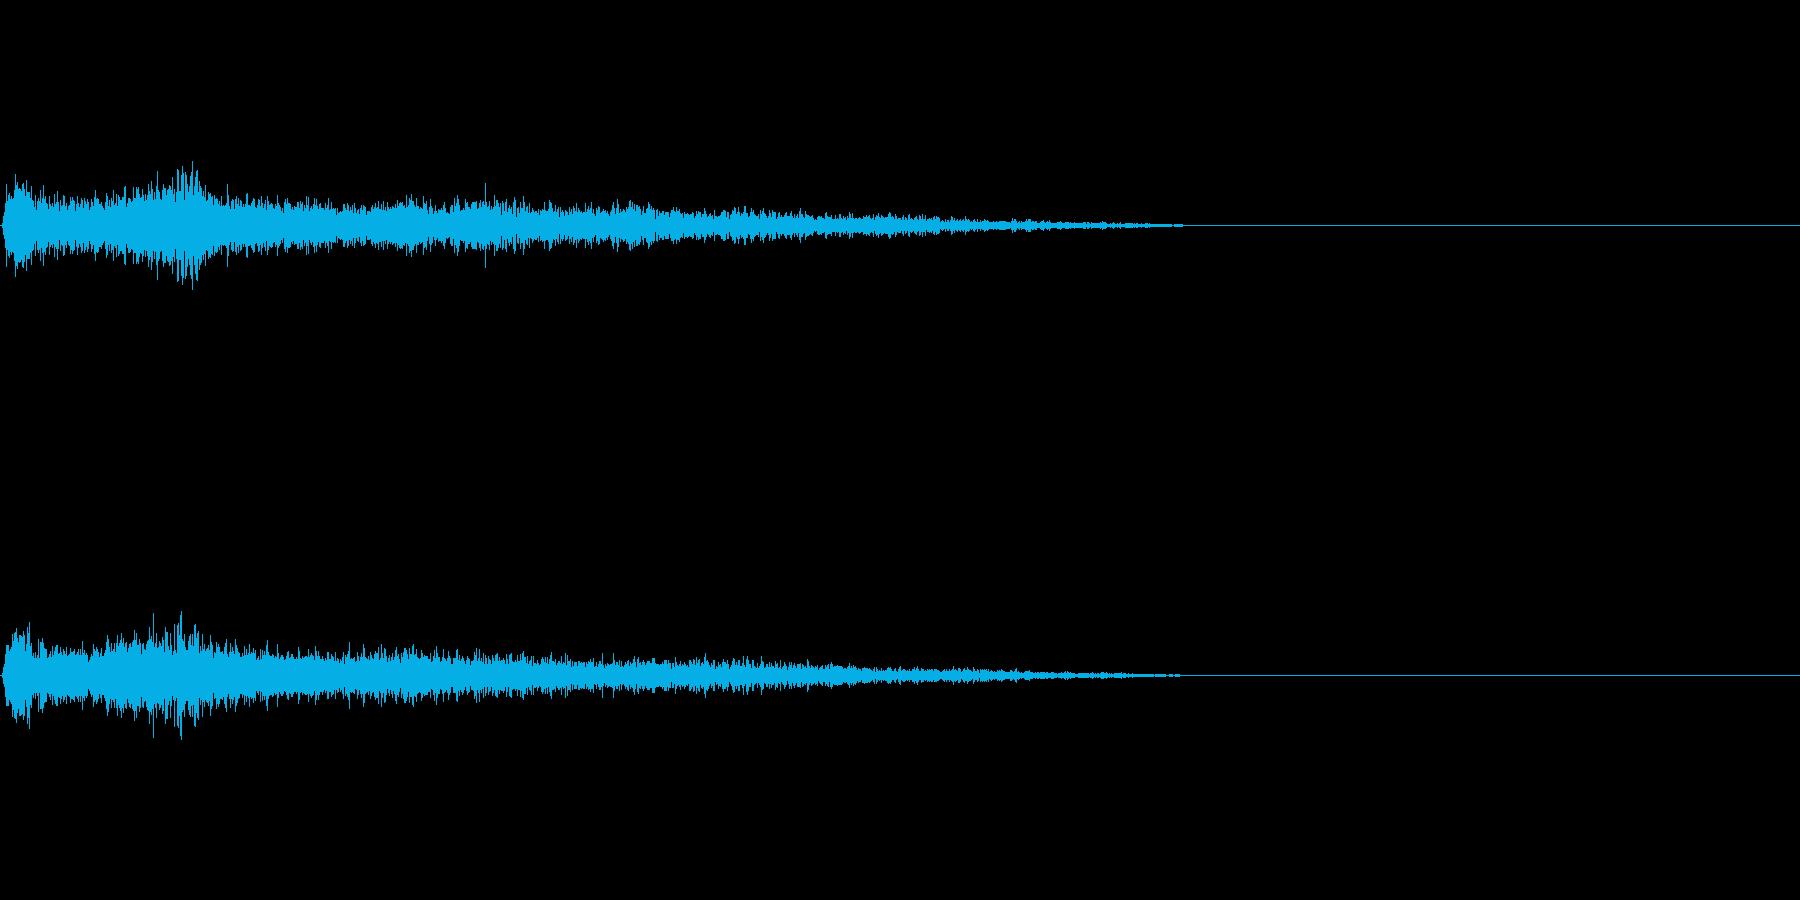 Fマイナー インパクト音 衝撃音の再生済みの波形